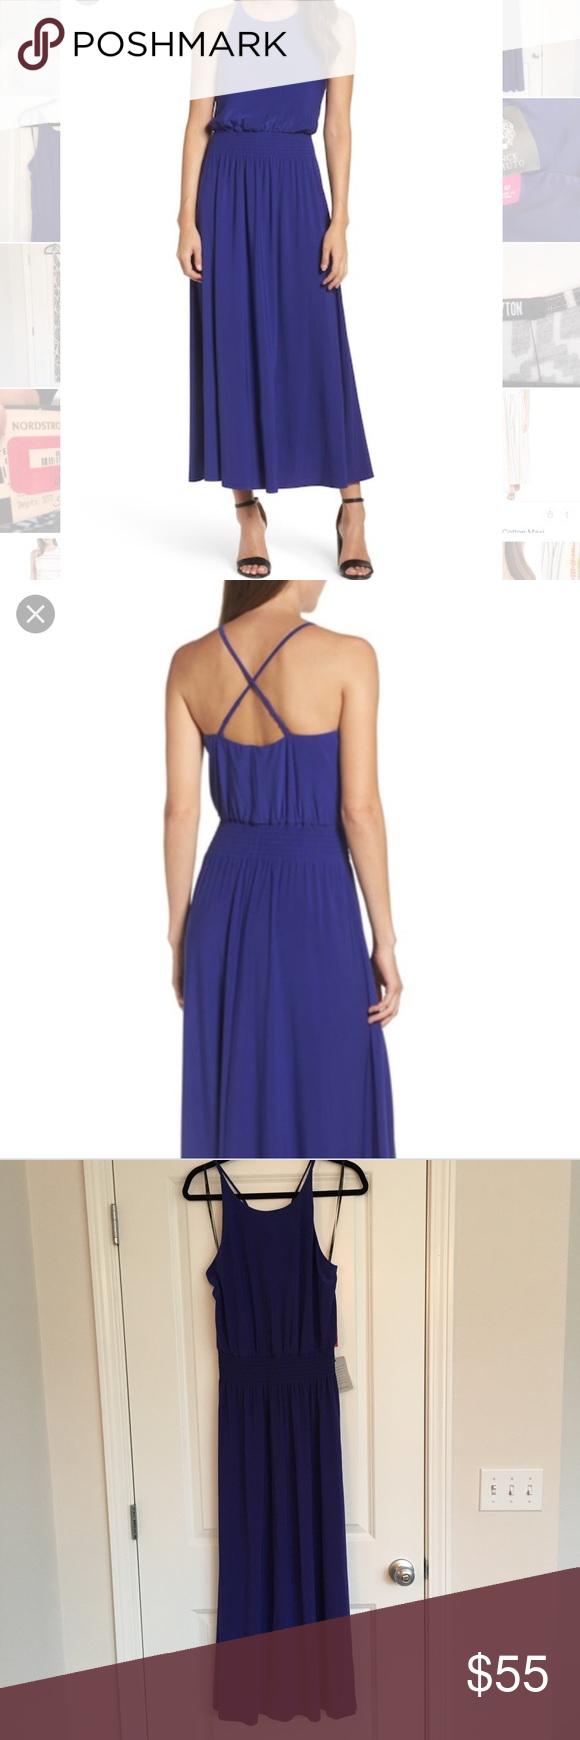 Vince Camuto Purple Maxi Dress Purple Maxi Dress Fashion Beautiful Maxi Dresses [ 1740 x 580 Pixel ]